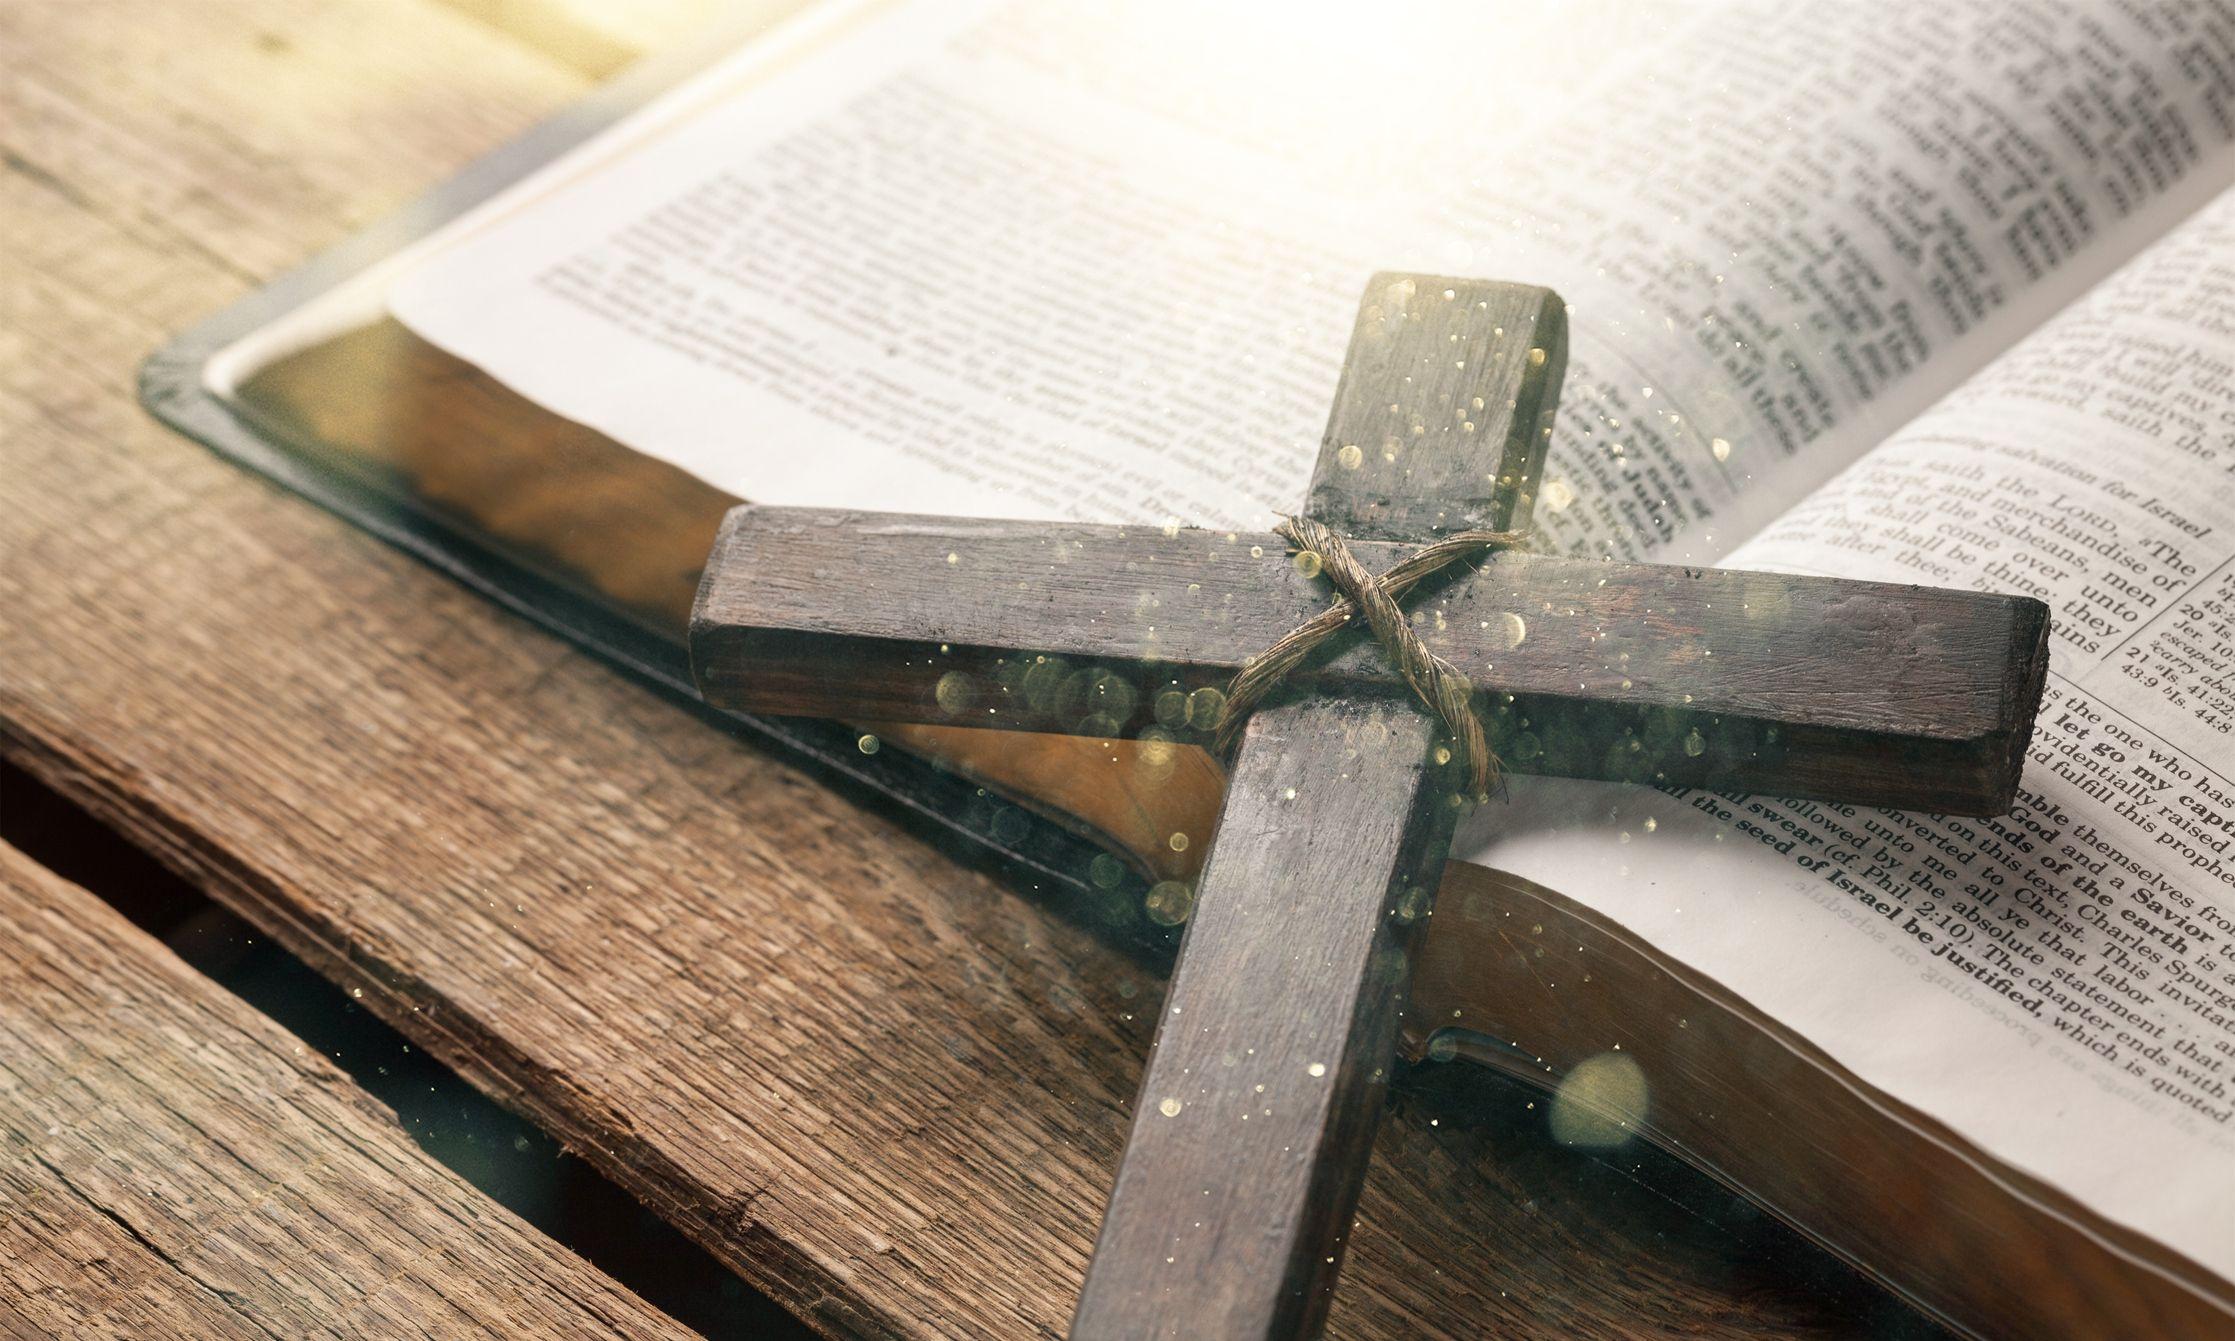 15 Diy Easter Cross Ideas Cross Crafts Ideas For Christian Home Decor